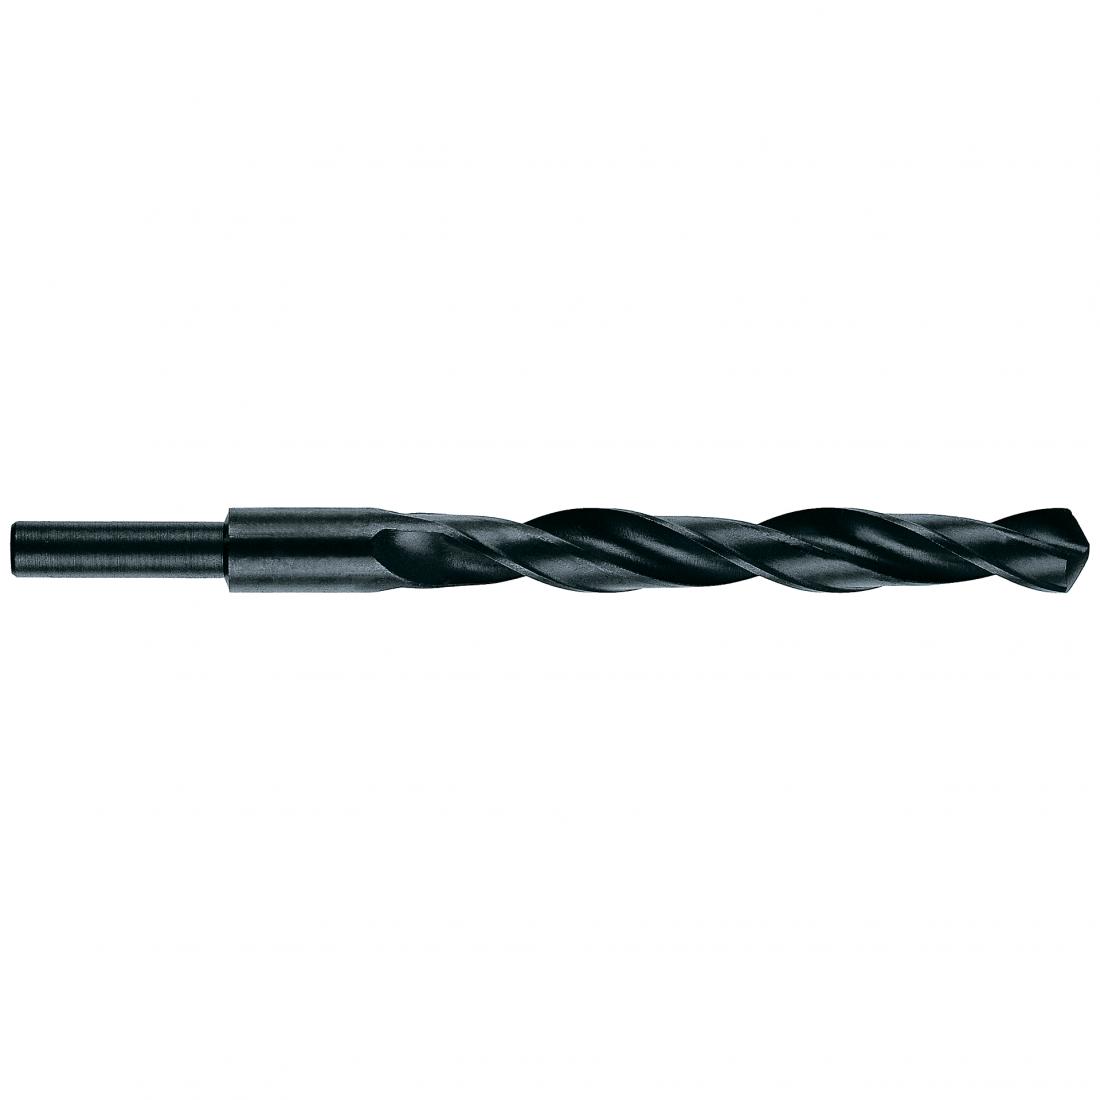 Сверло по металлу Heller HSS cо ступенчатым хвостовиком 18,5х135х198мм